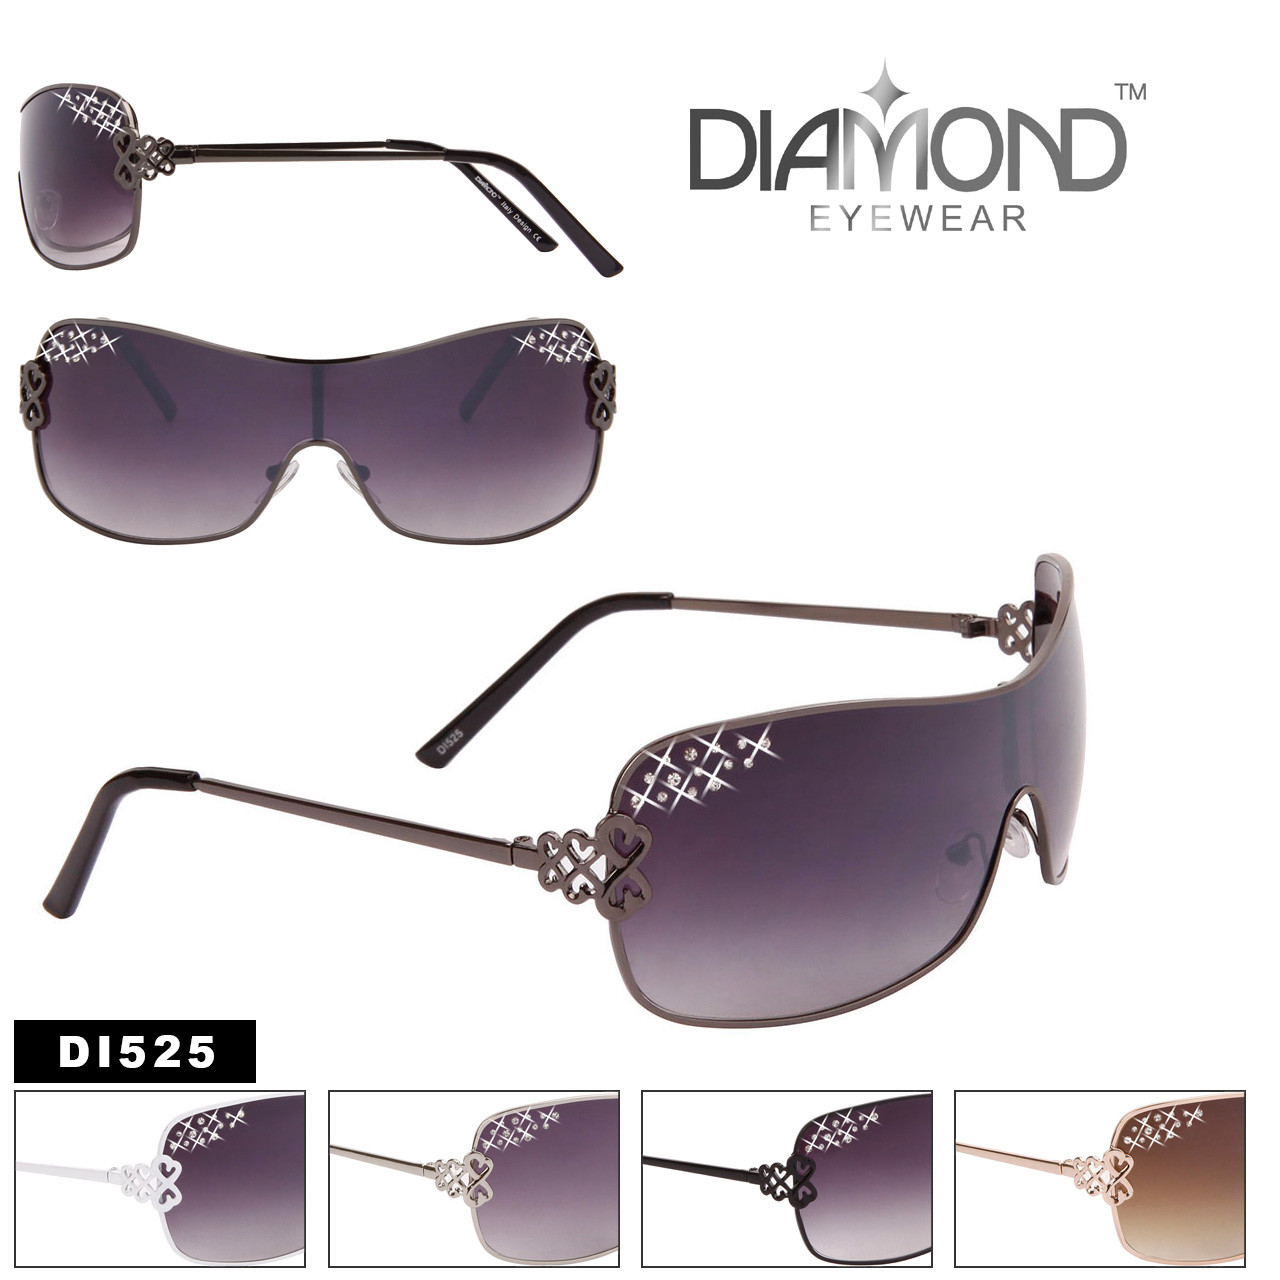 One Piece Lens Rhinestones and Hearts Diamond™Eyewear Sunglasses - Style #DI525